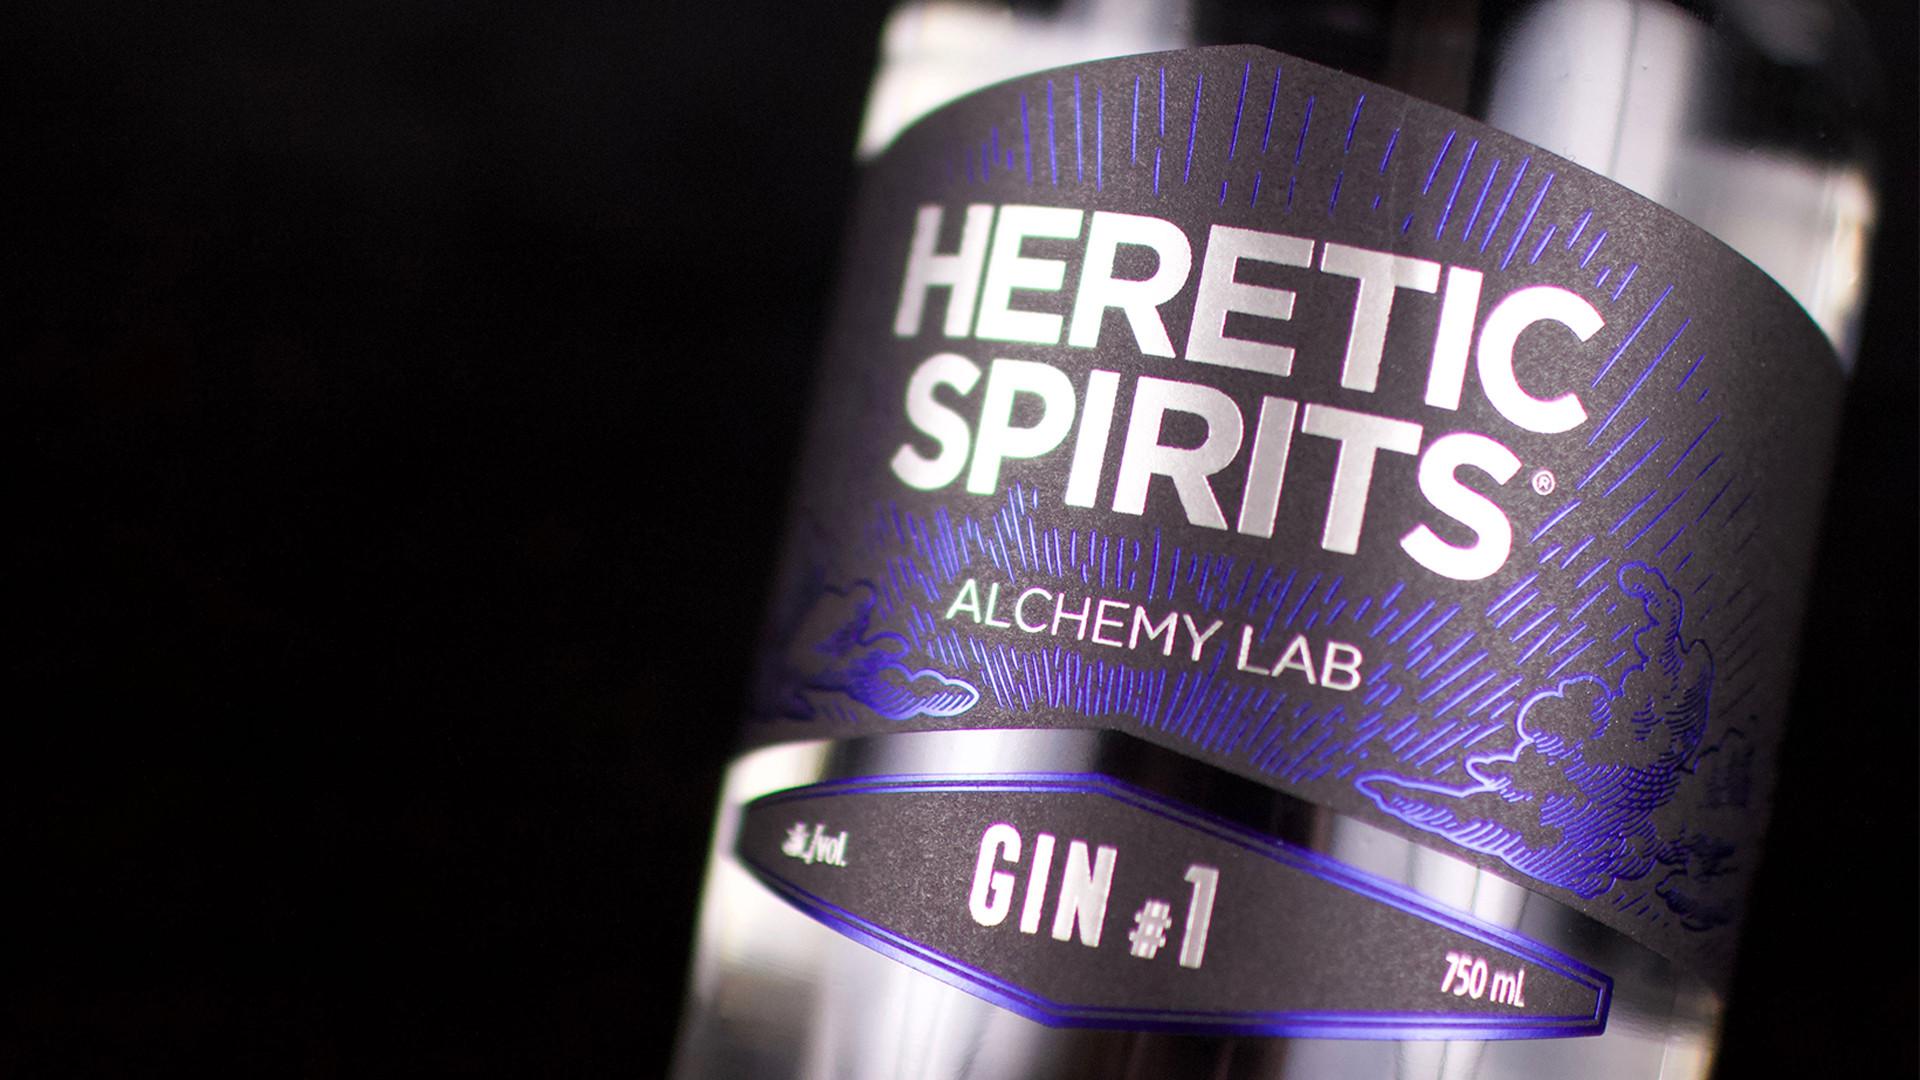 Heretic Spirits award-winning vodka and gin | Heretic Spirits Gin #1